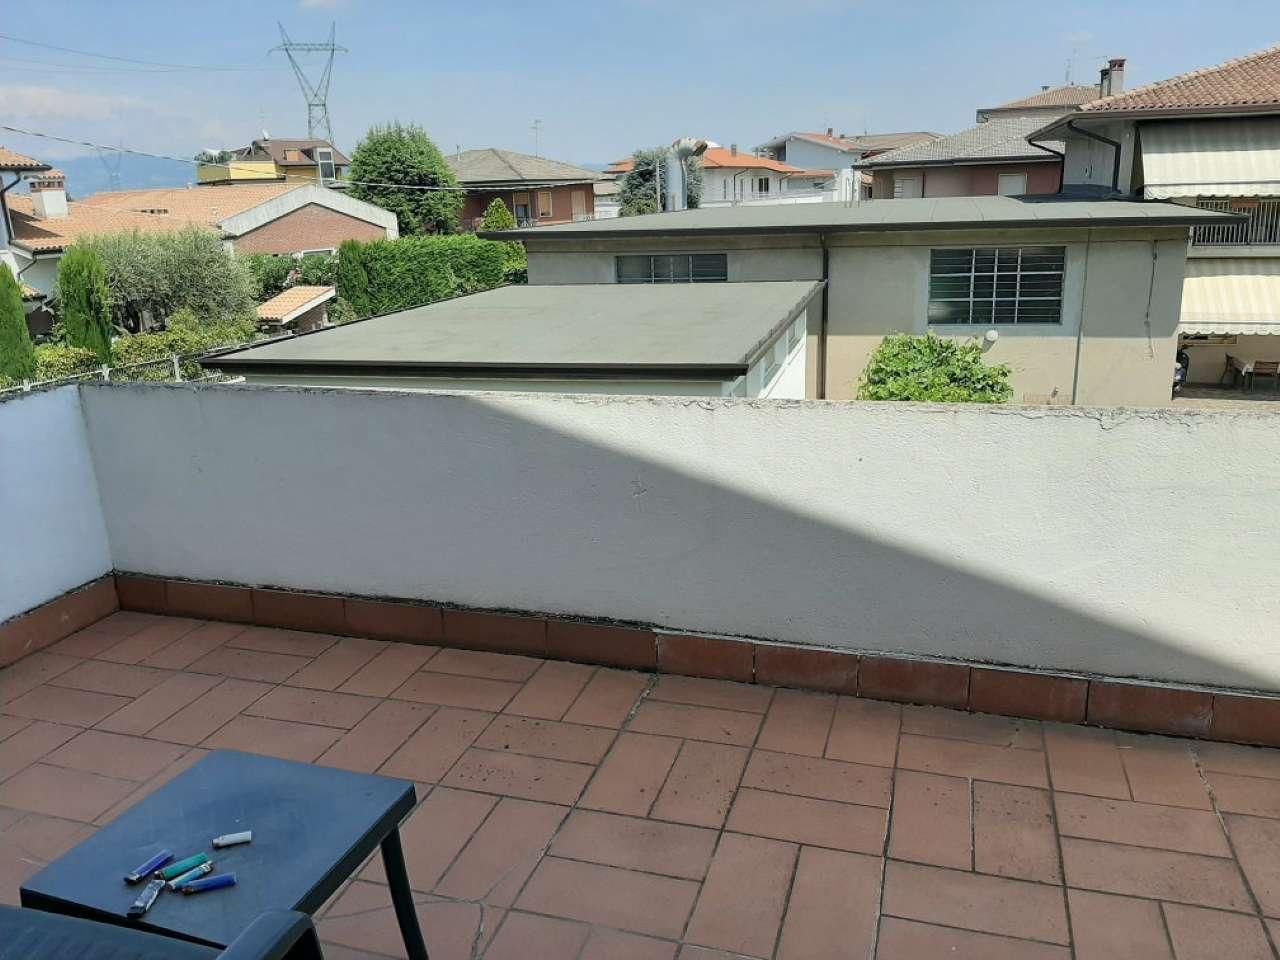 Bussolengo - Villa con giardino, foto 17